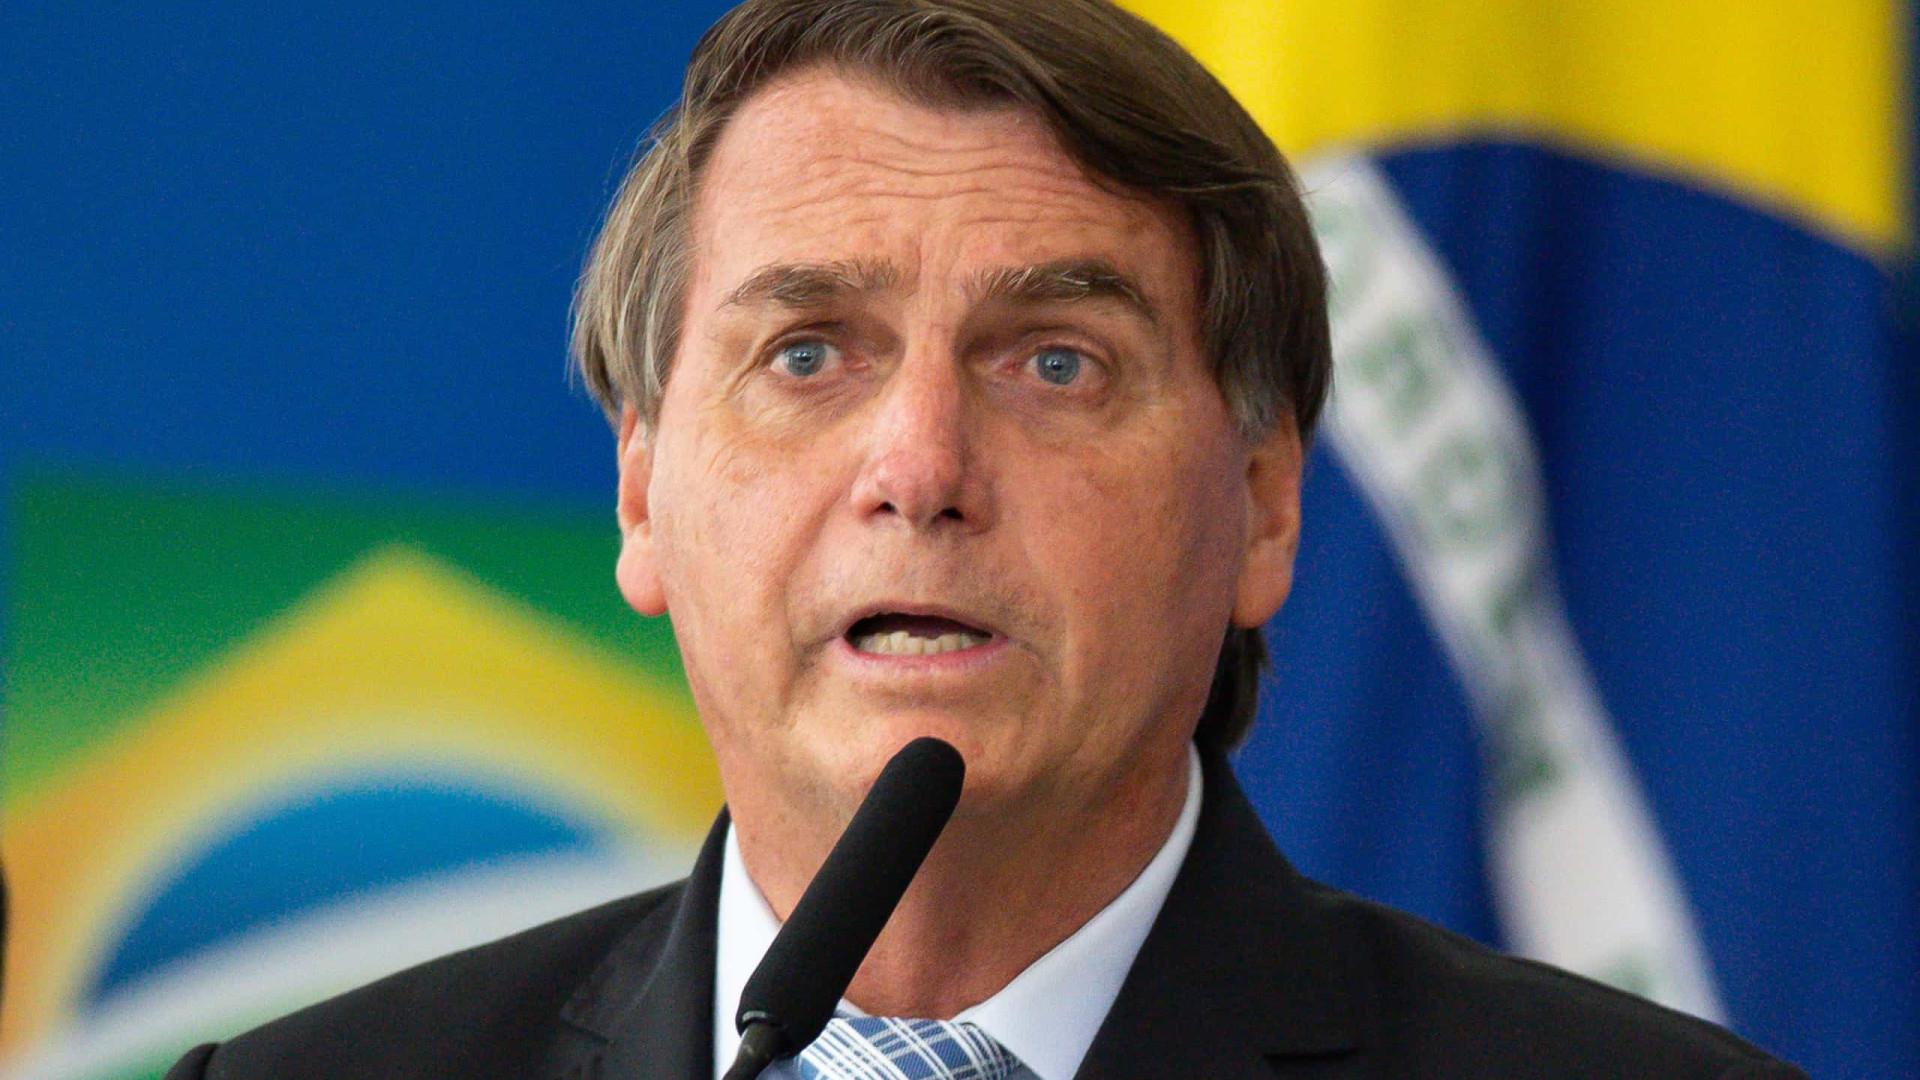 Após STF manter Lula elegível, Bolsonaro admite candidatura